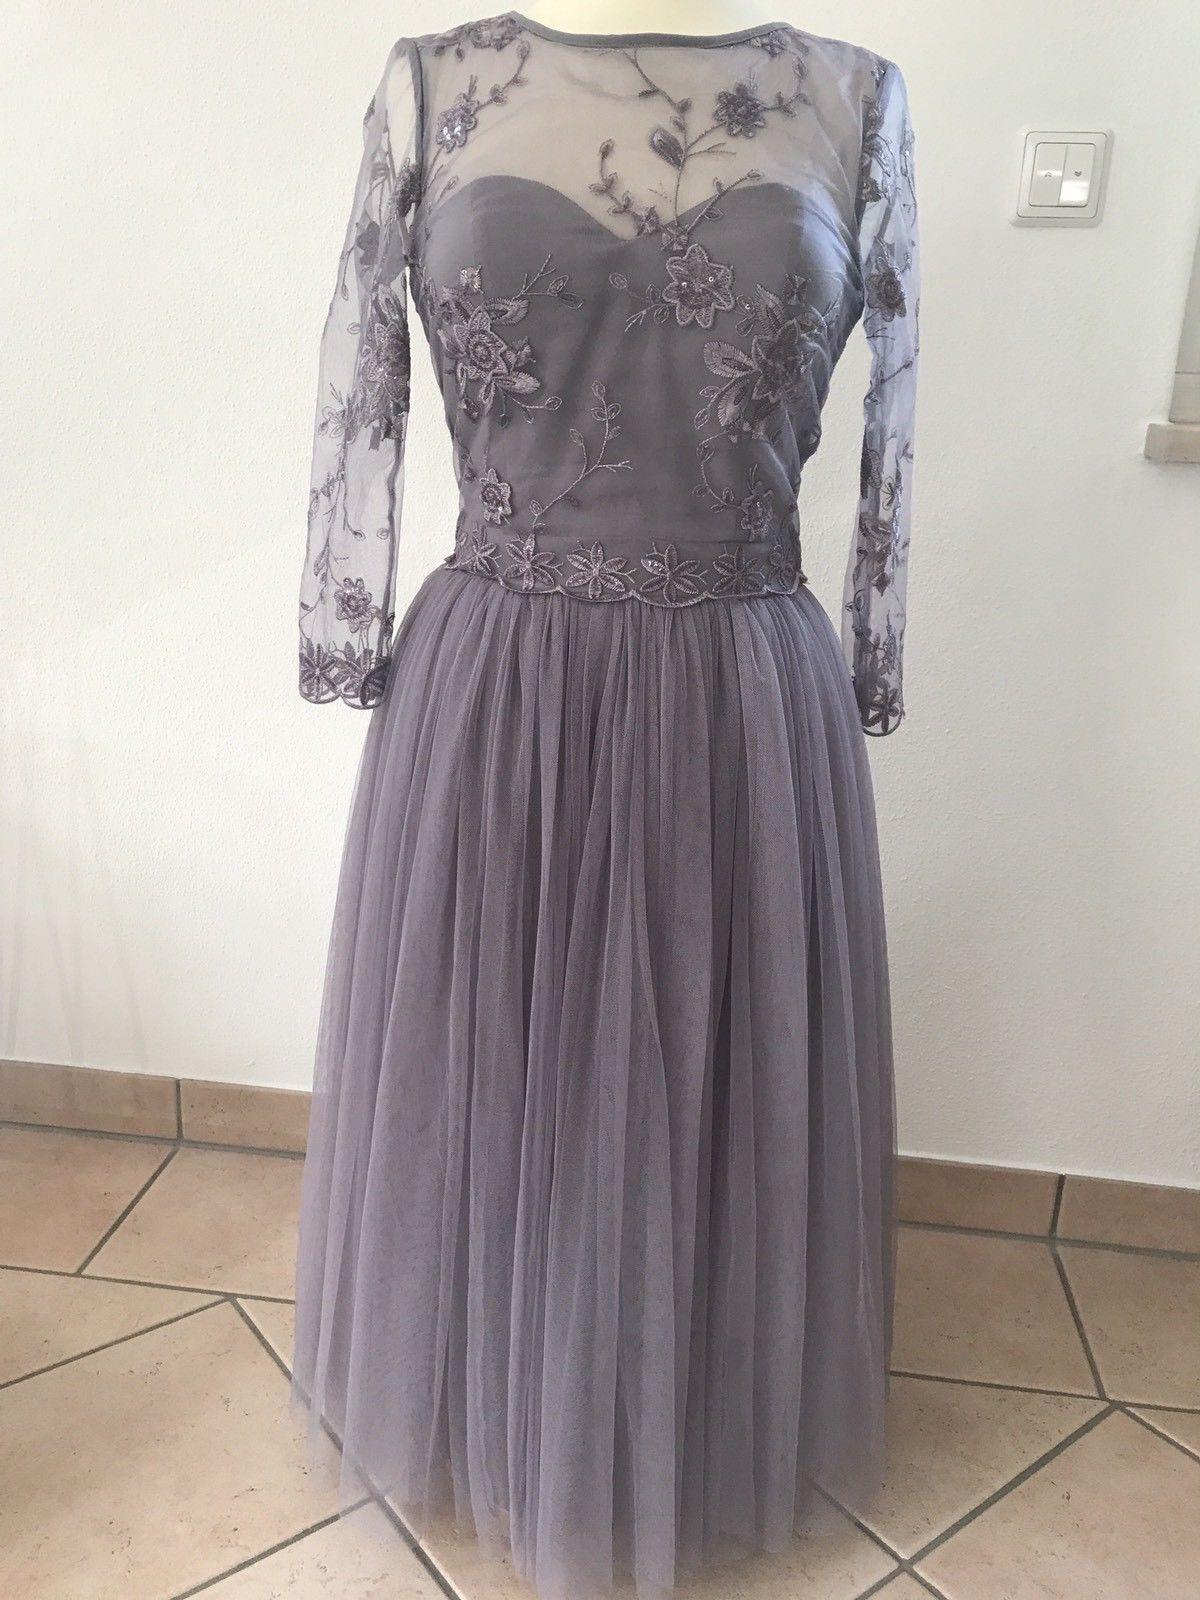 Designer Einzigartig Abendkleid Blau Lang Spezialgebiet15 Coolste Abendkleid Blau Lang Vertrieb